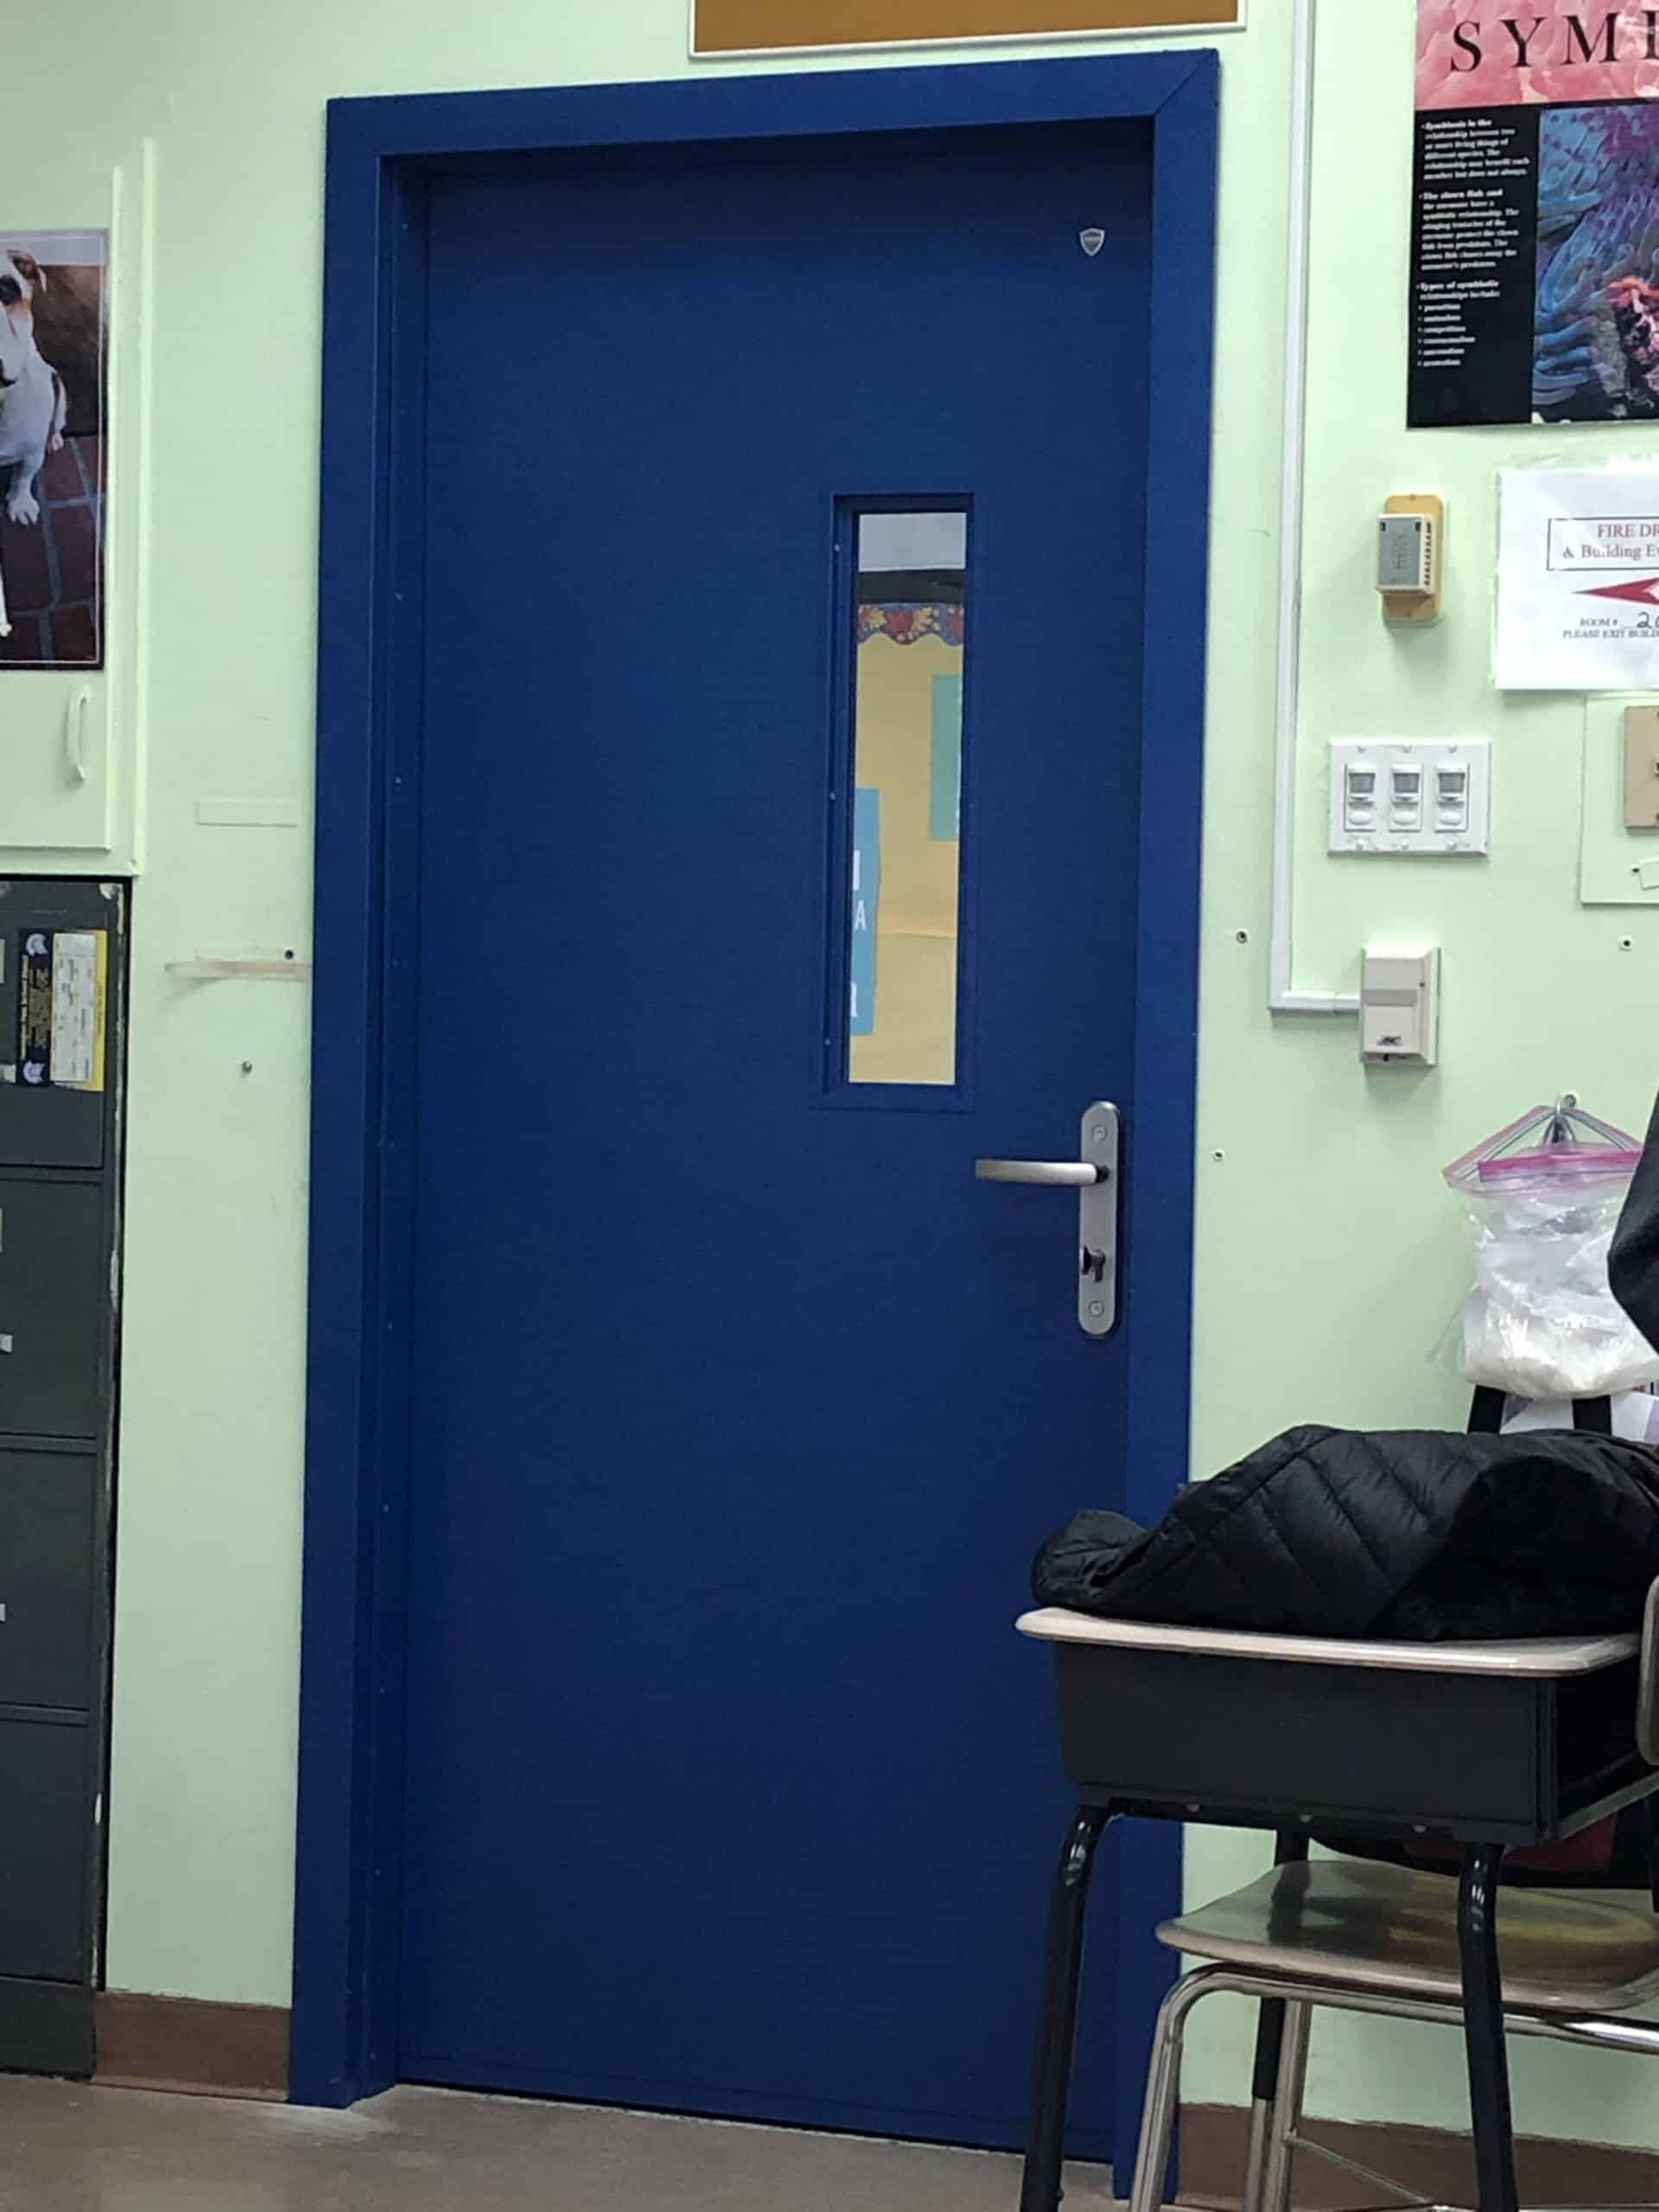 Feel safe on school class with bullet resistant doors